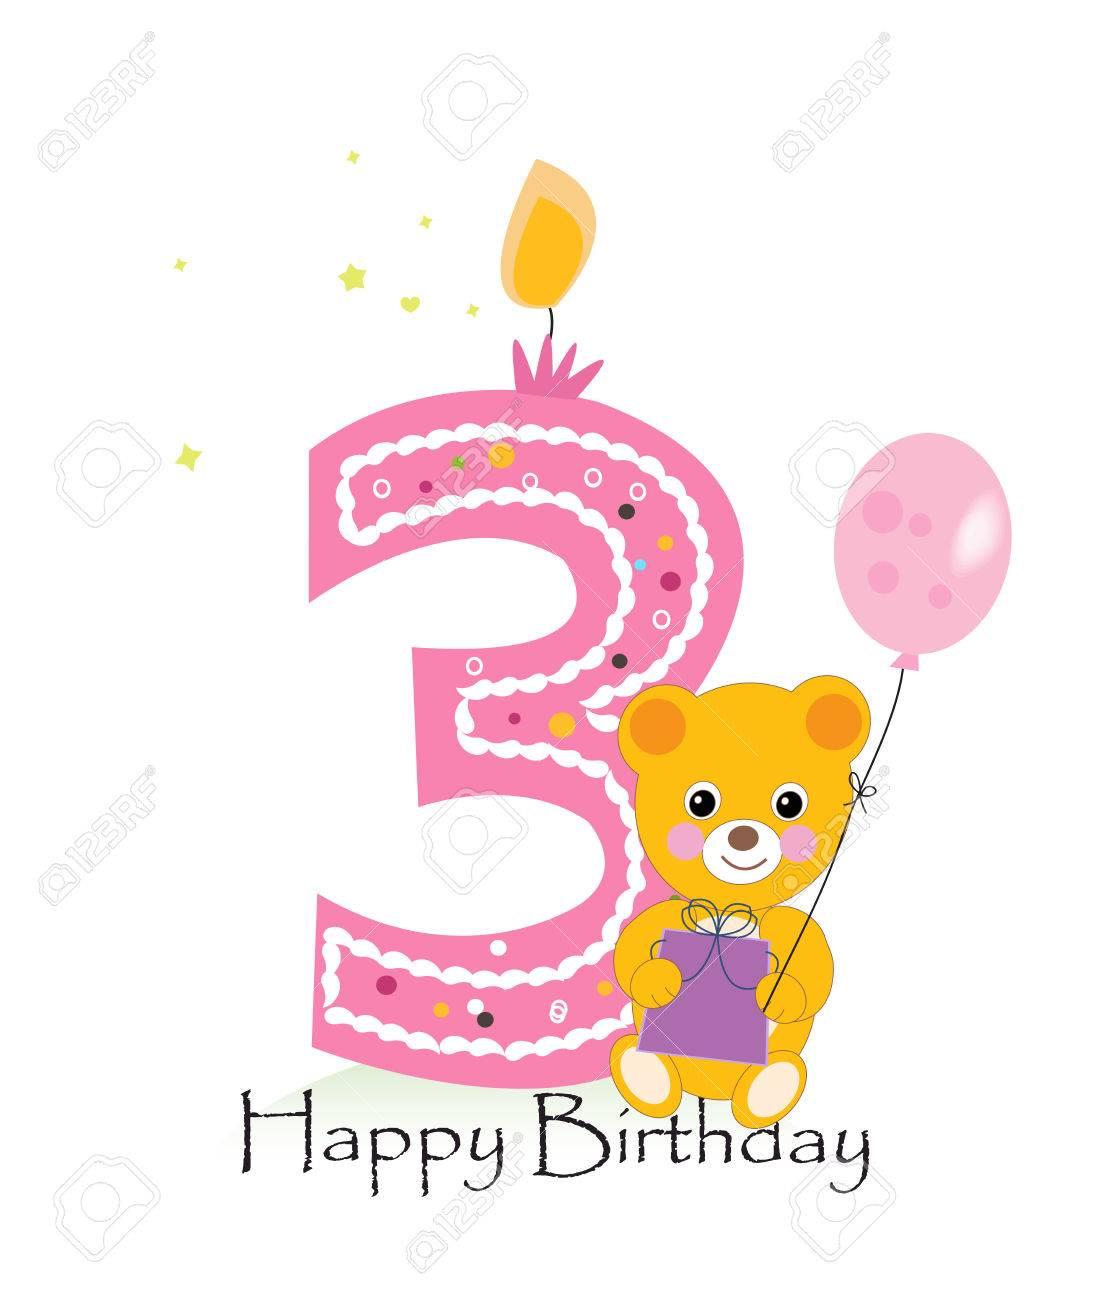 Happy third birthday candle baby birthday greeting card with happy third birthday candle baby birthday greeting card with teddy bear vector background stock vector m4hsunfo